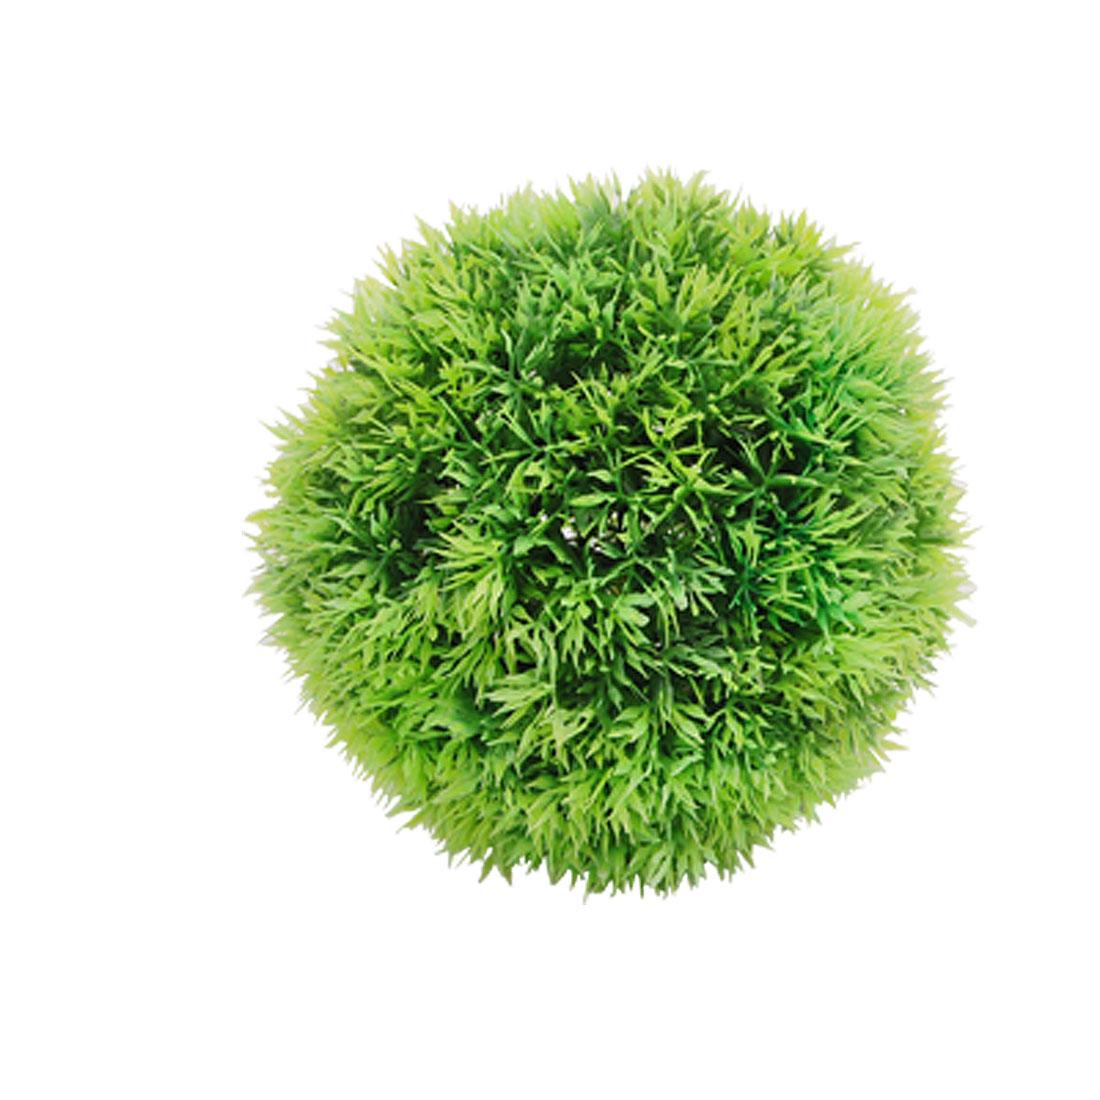 Aquarium Plastic Plants Round Shaped Ornament with Base